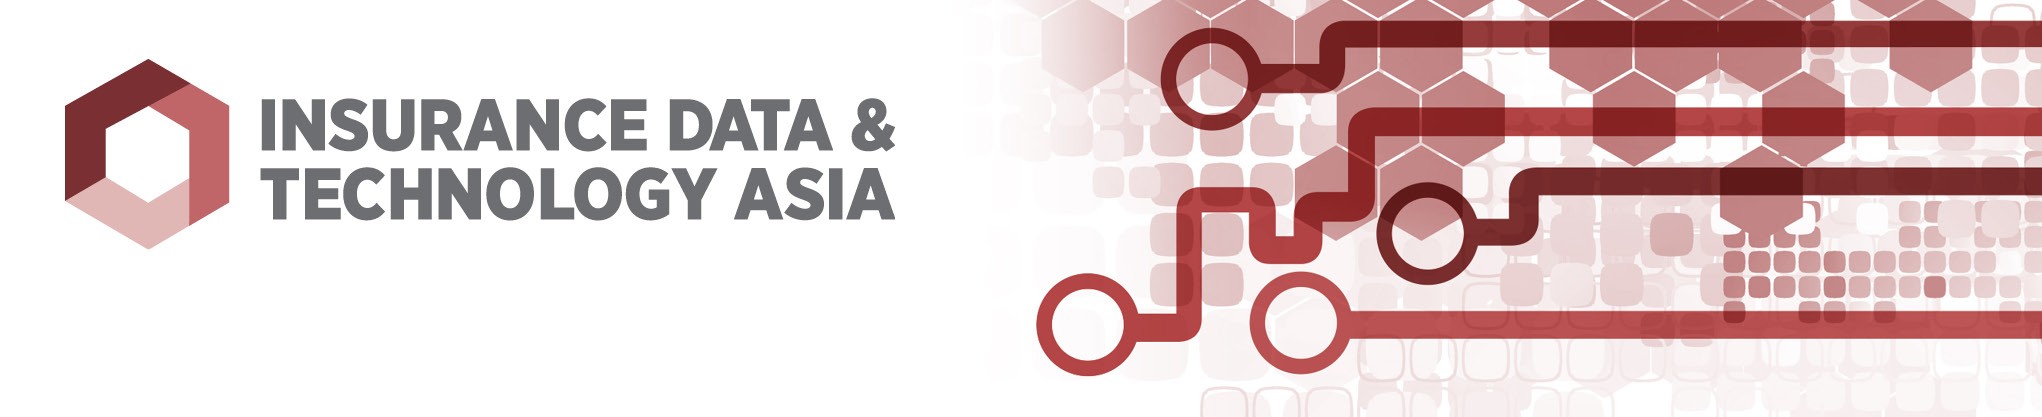 Insurance Data & Technology Asia 2016